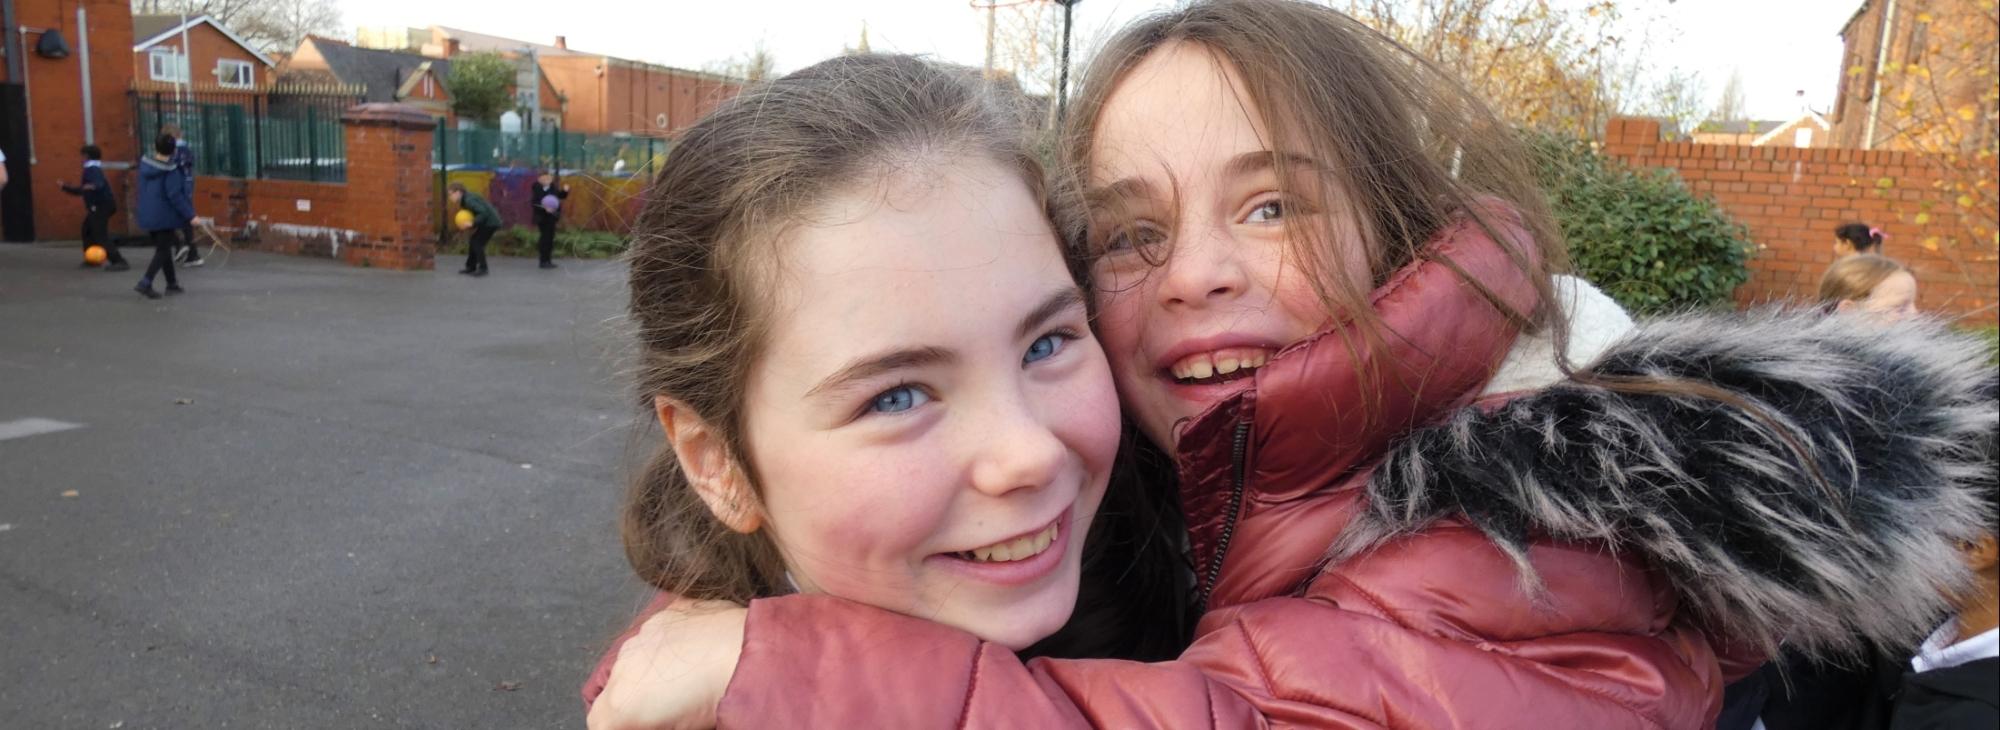 Lewis Street Primary School 4